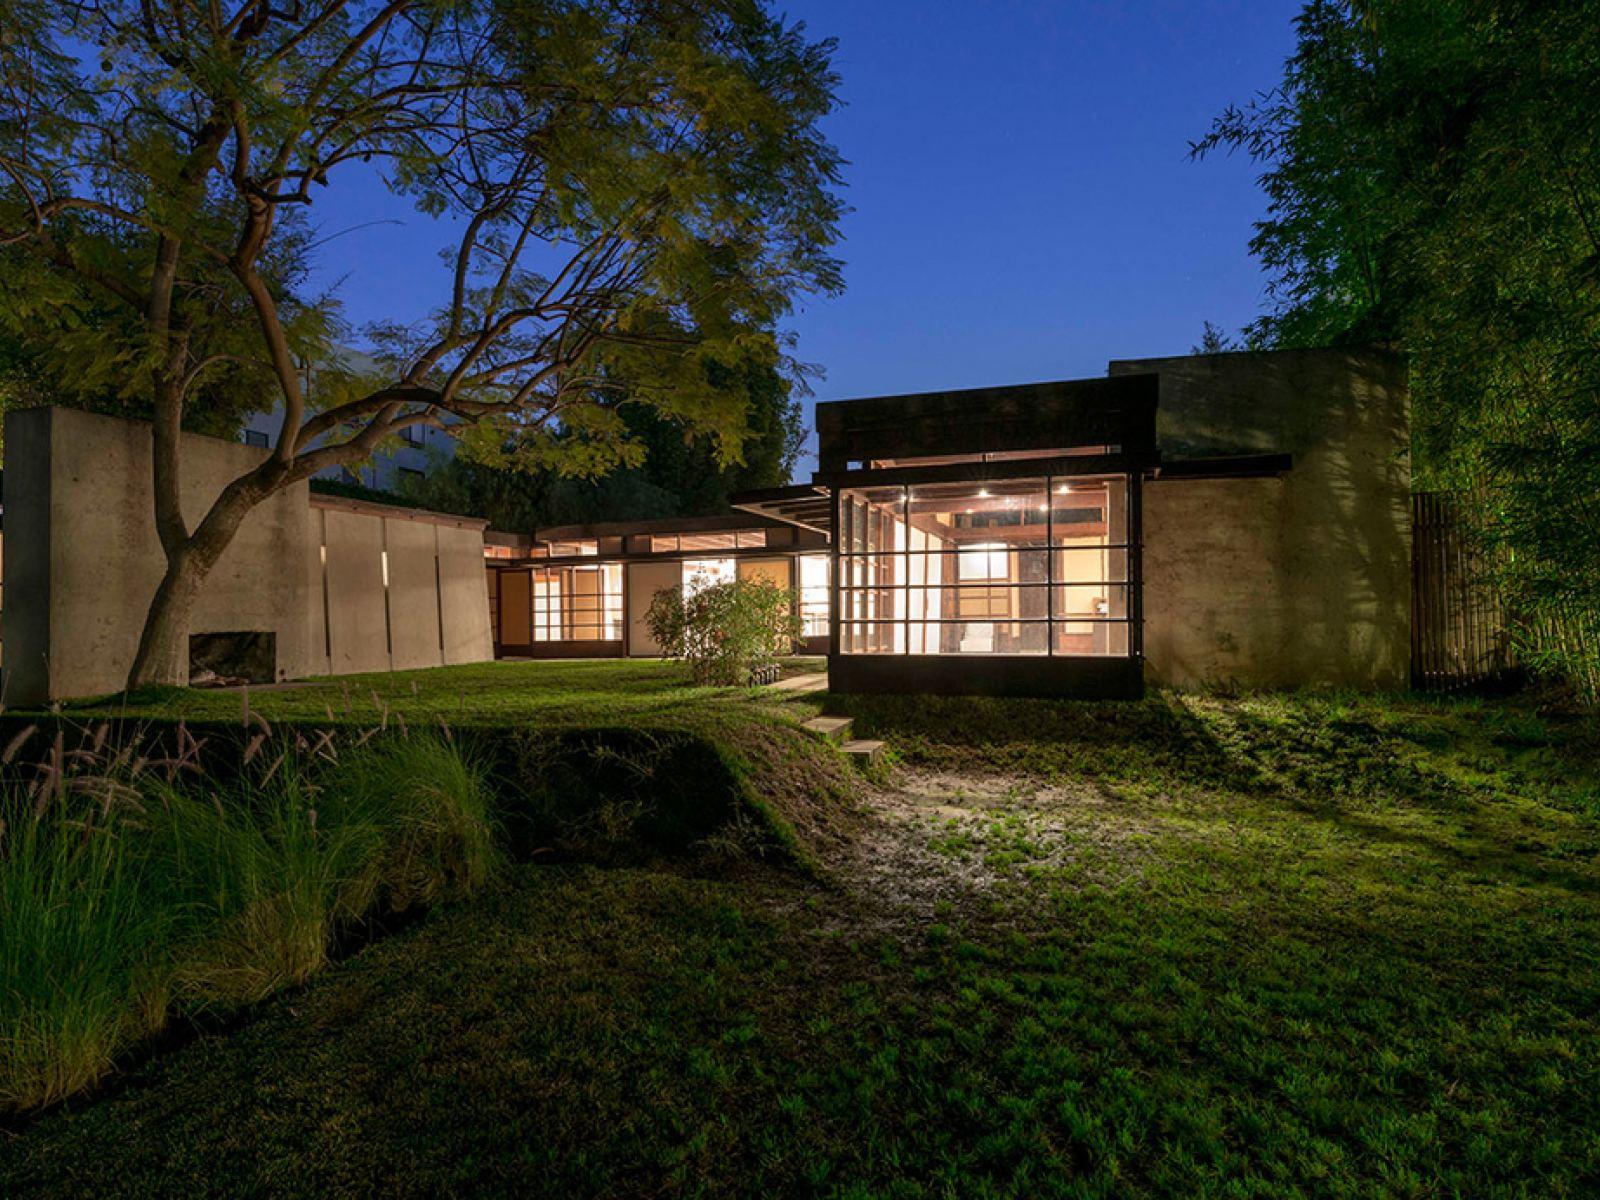 Schindler House | Photo by Joshua White, courtesy of MAK Center